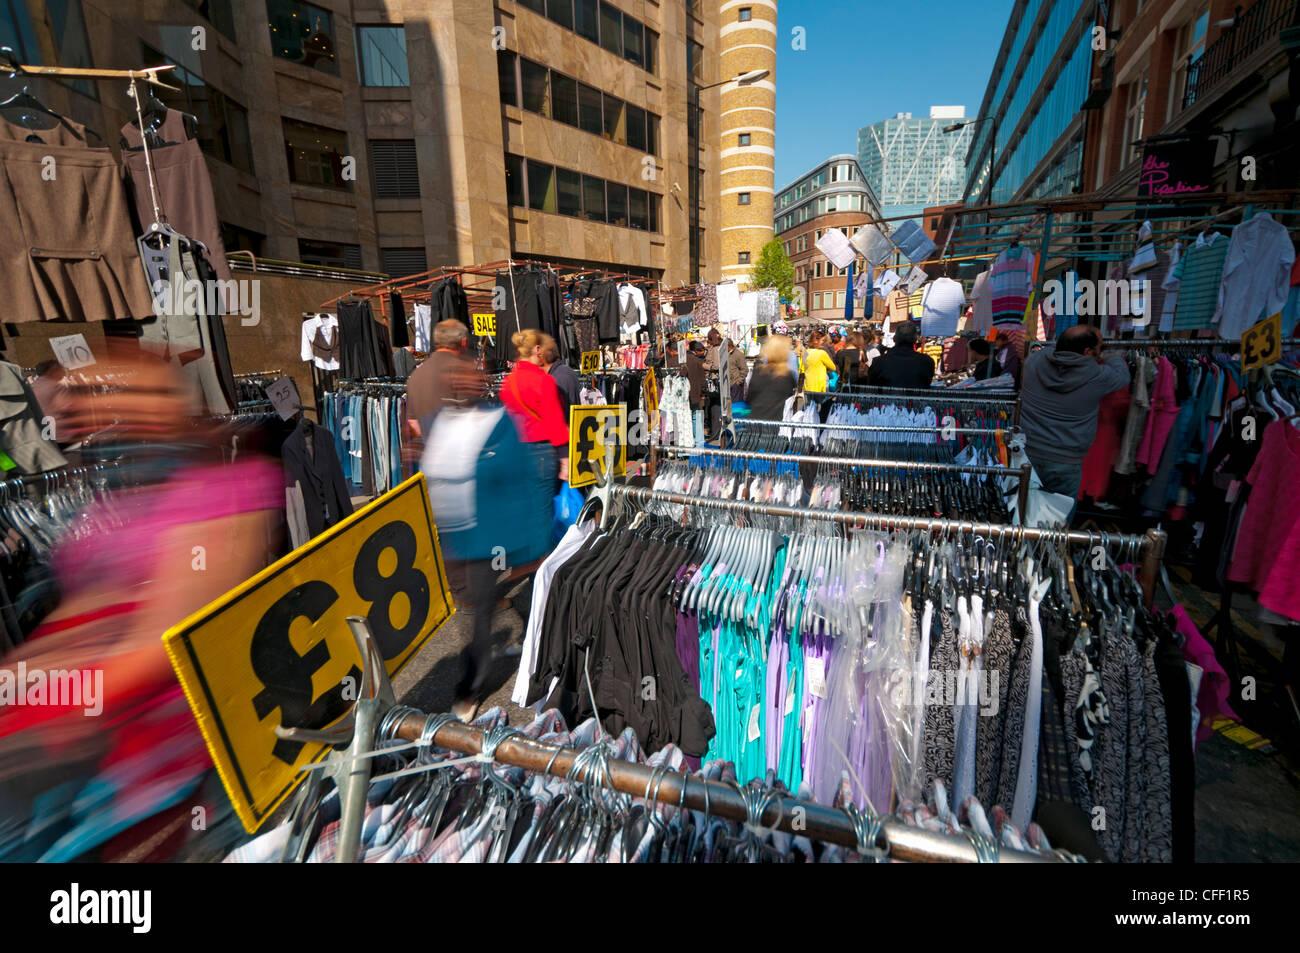 Petticoat Lane Market, The East End, London, England, United Kingdom, Europe - Stock Image